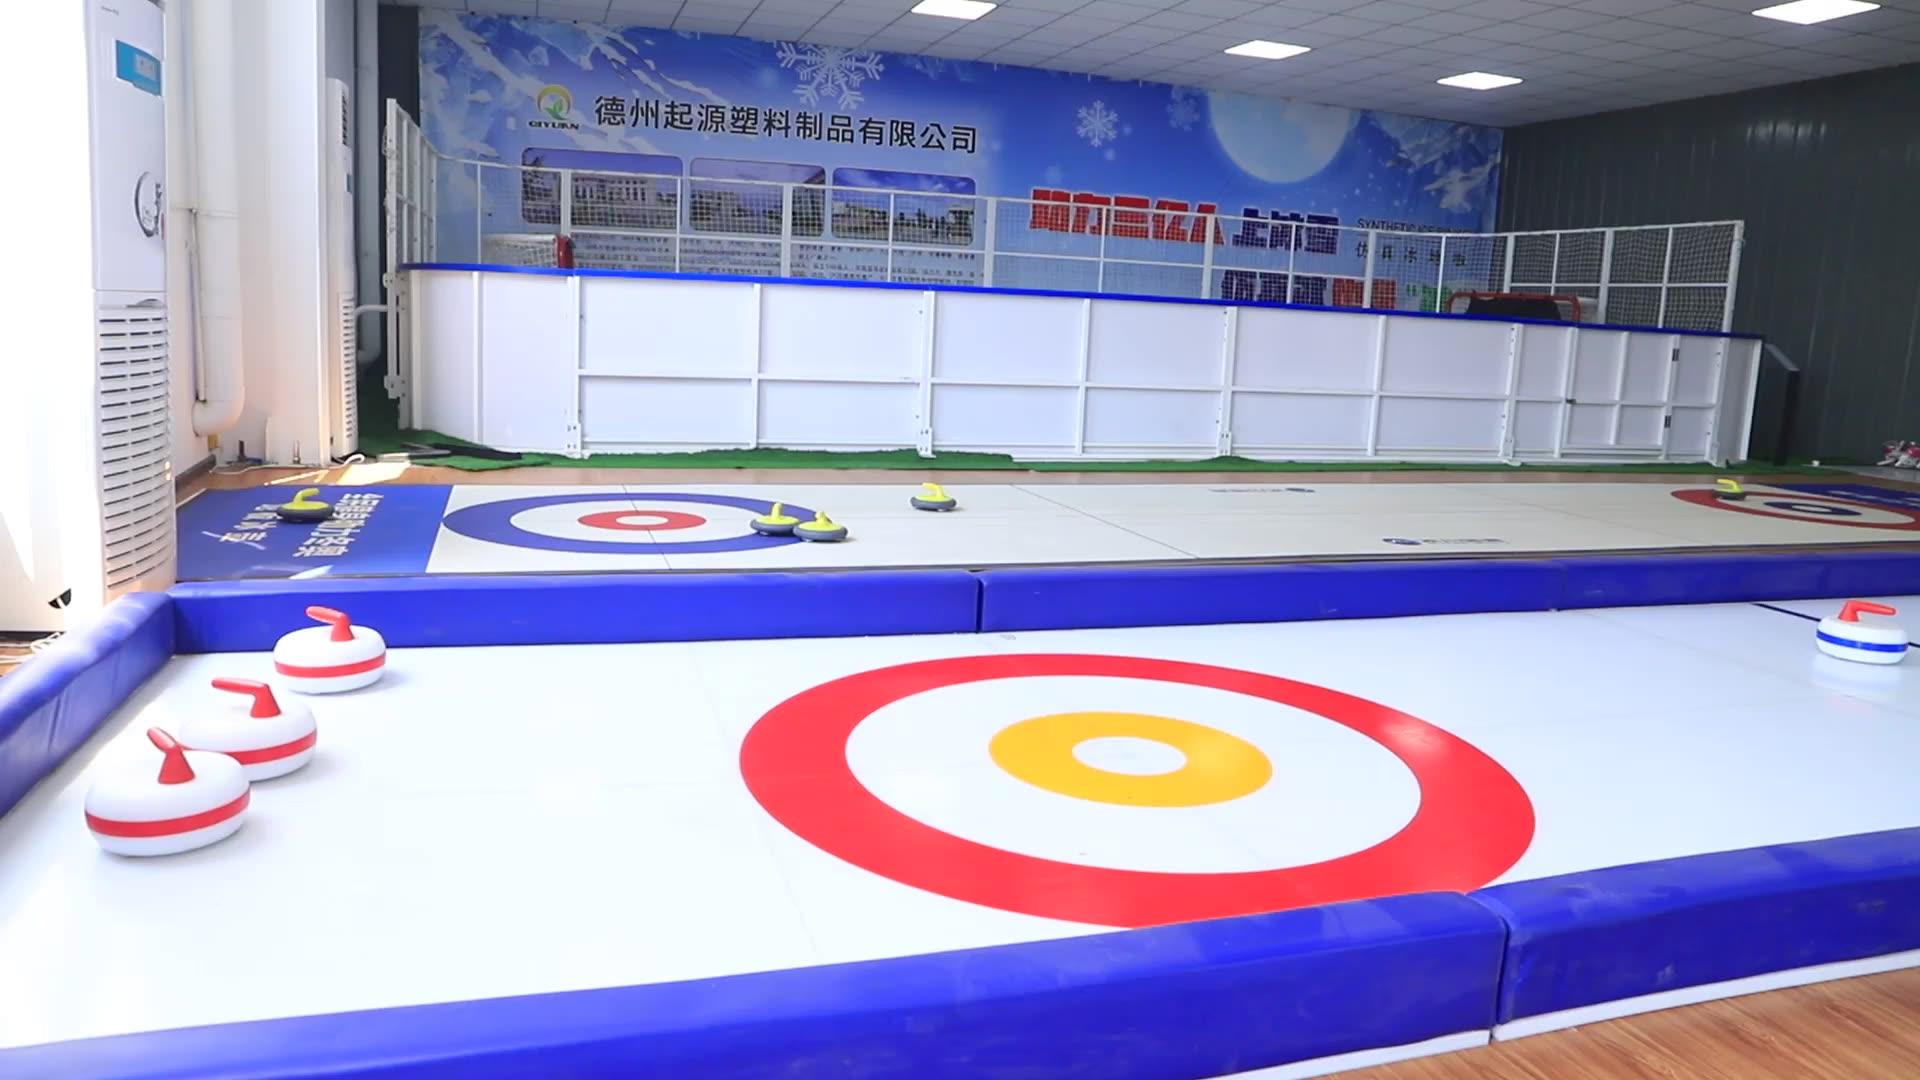 UHMW glide board PE 1000 curling practice board roller skate mat